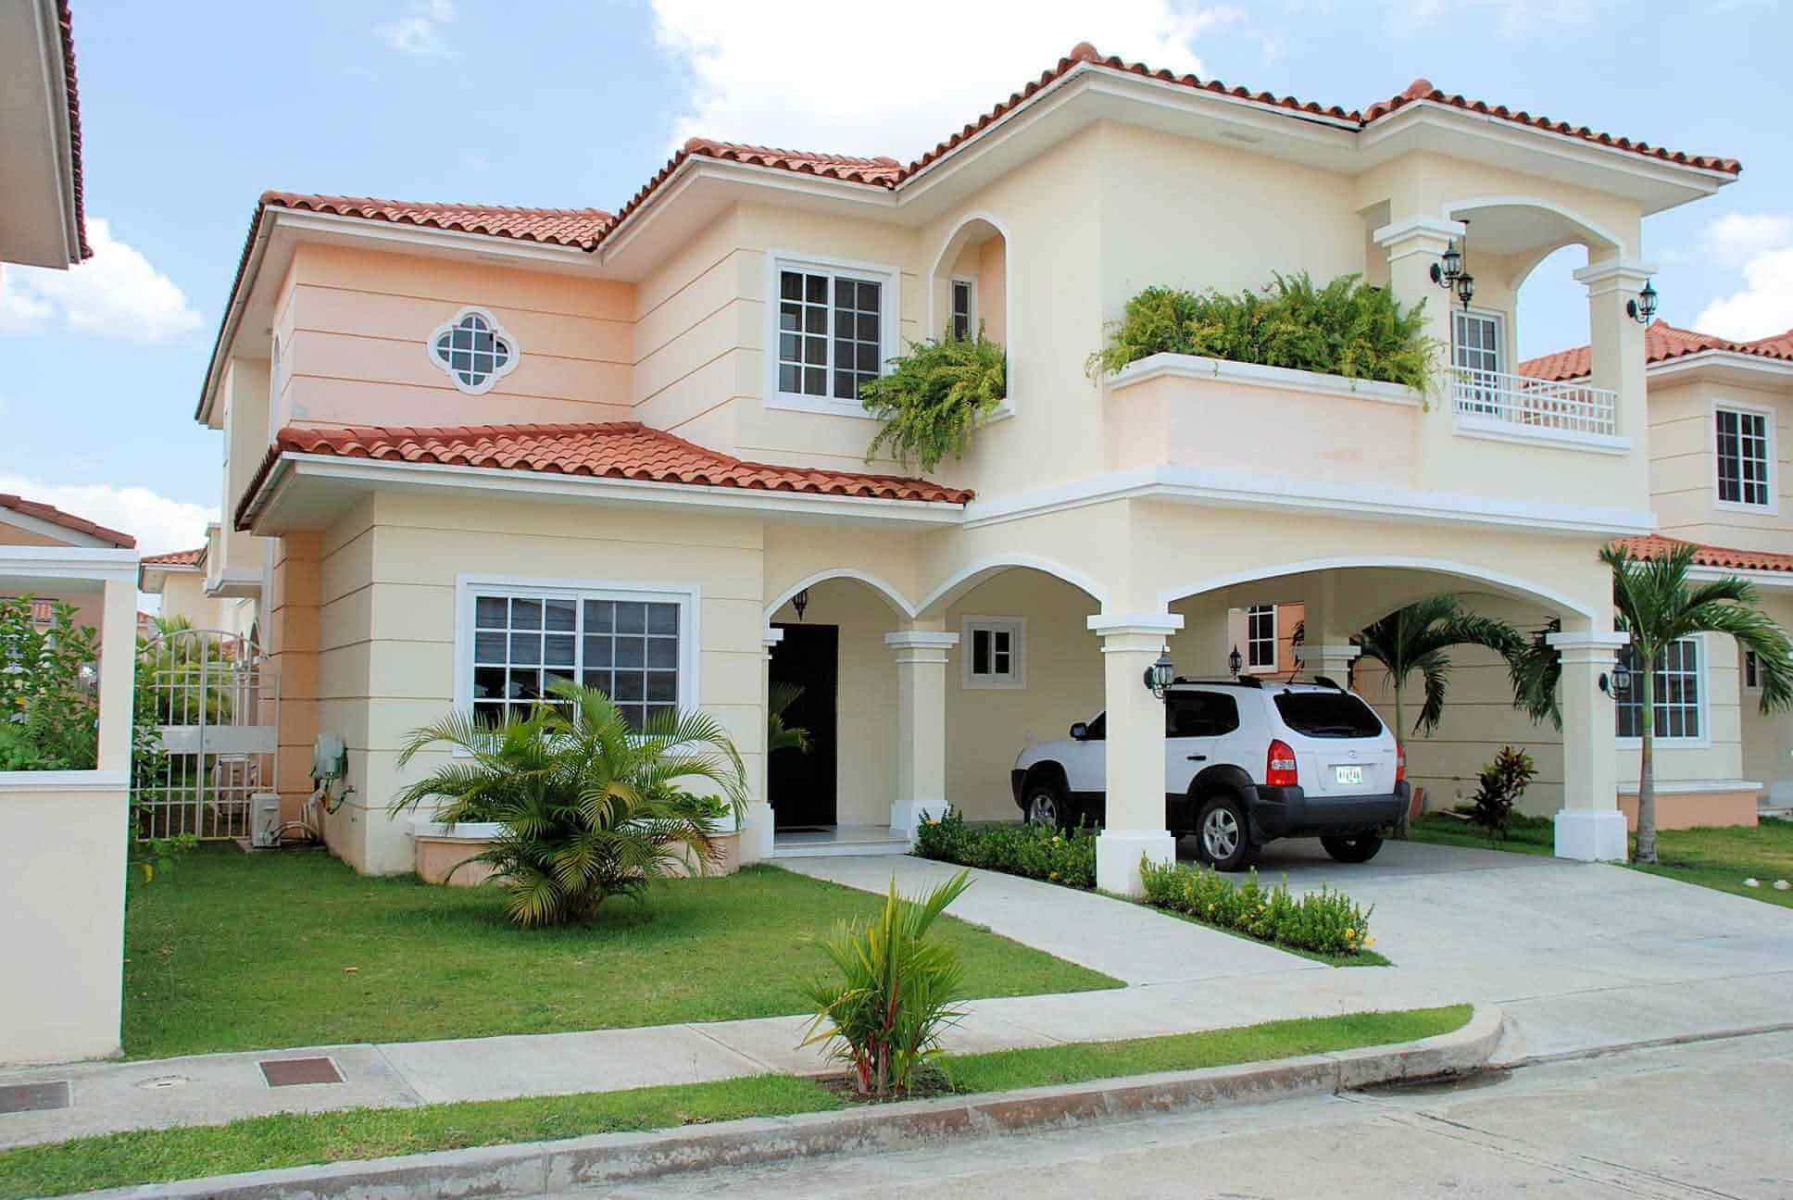 Alquiler de casas en panam casas panam for Alquiler casa en umbrete sevilla